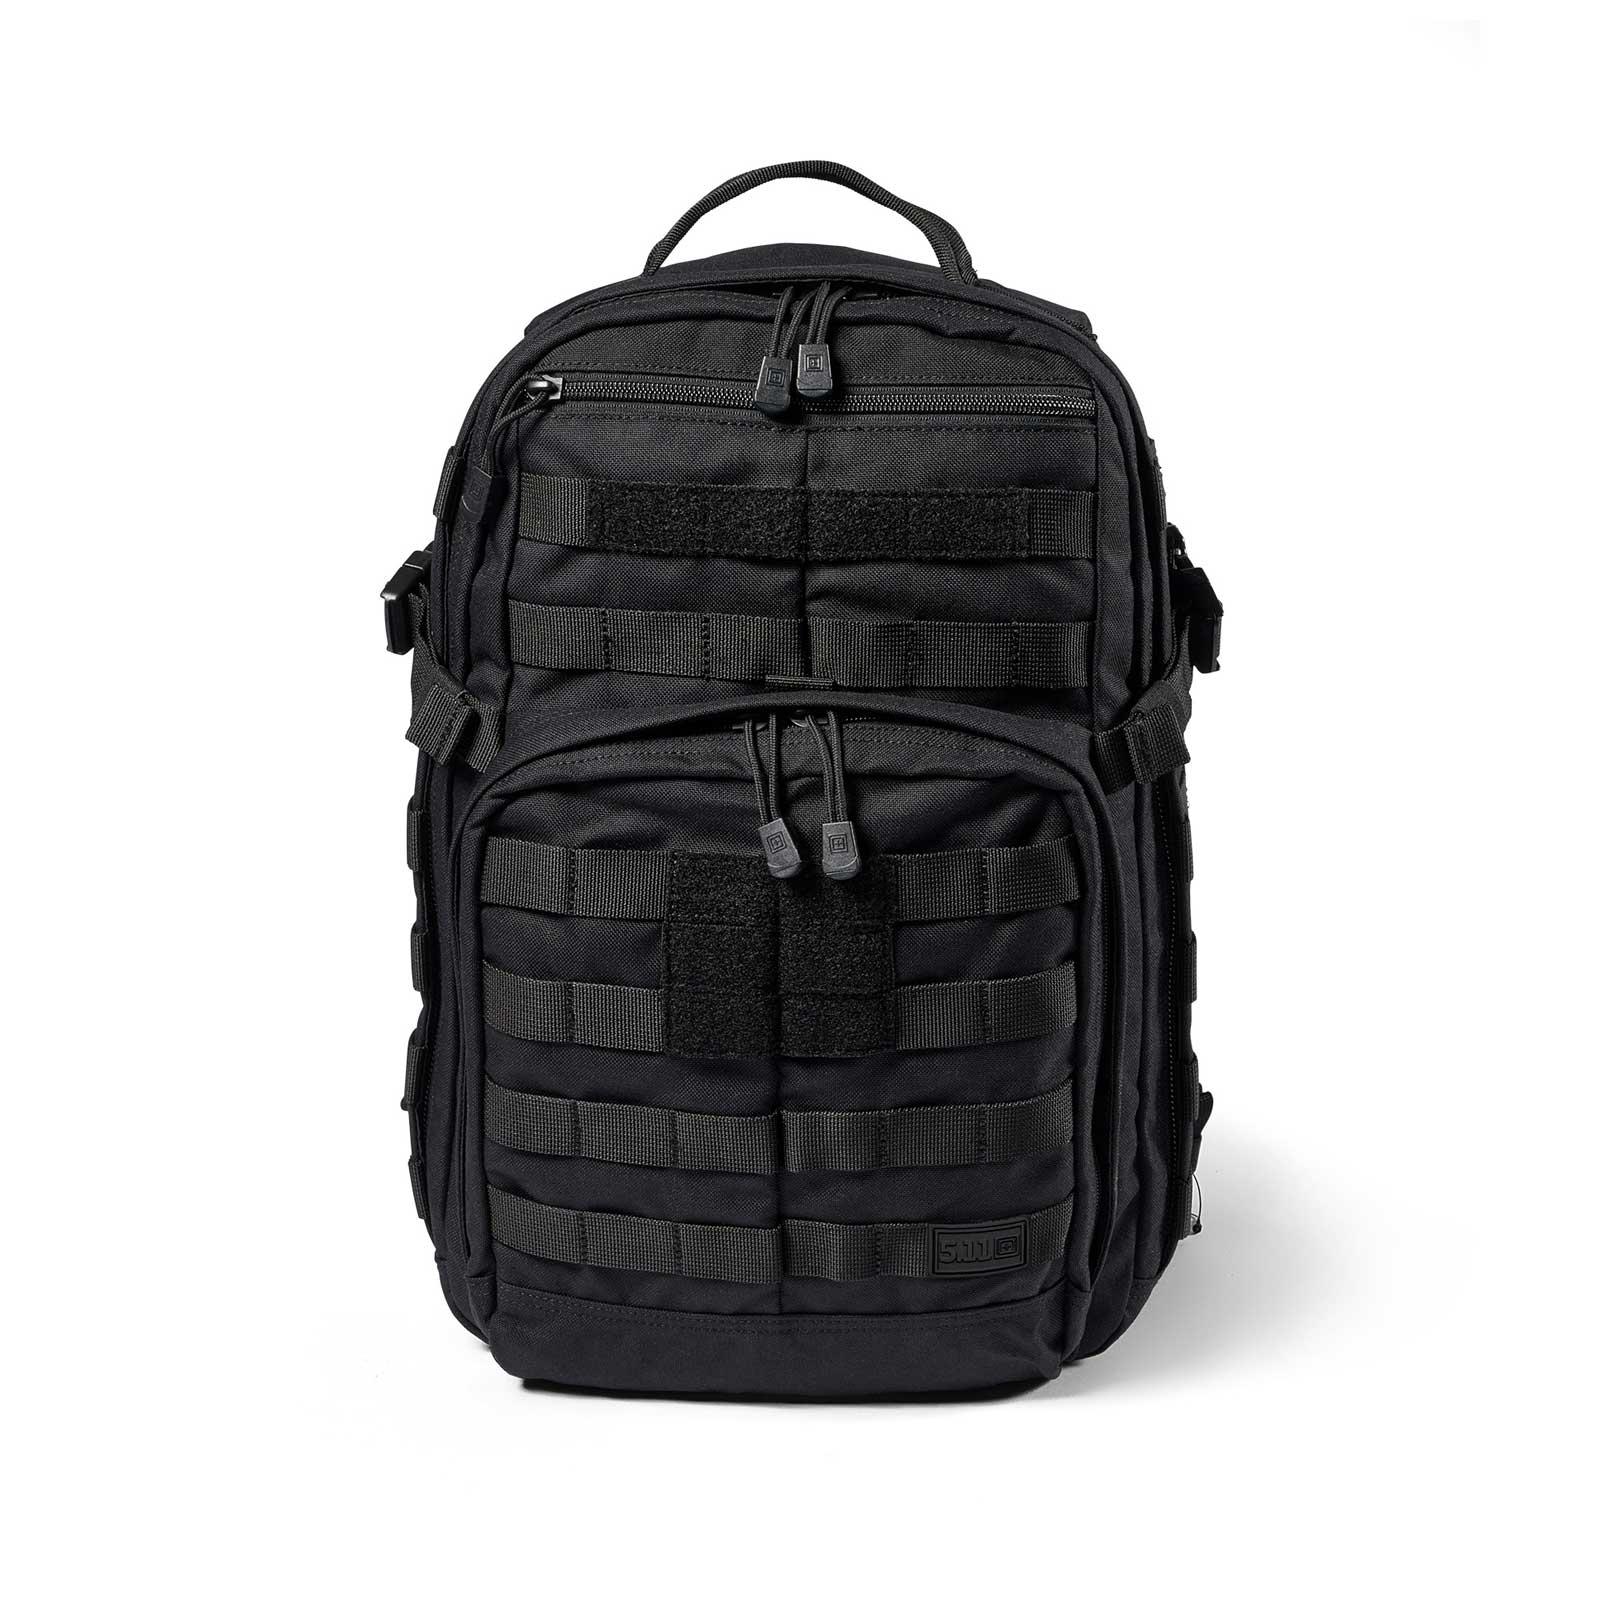 Balo 5.11 Tactical Rush 12 2.0 – Black